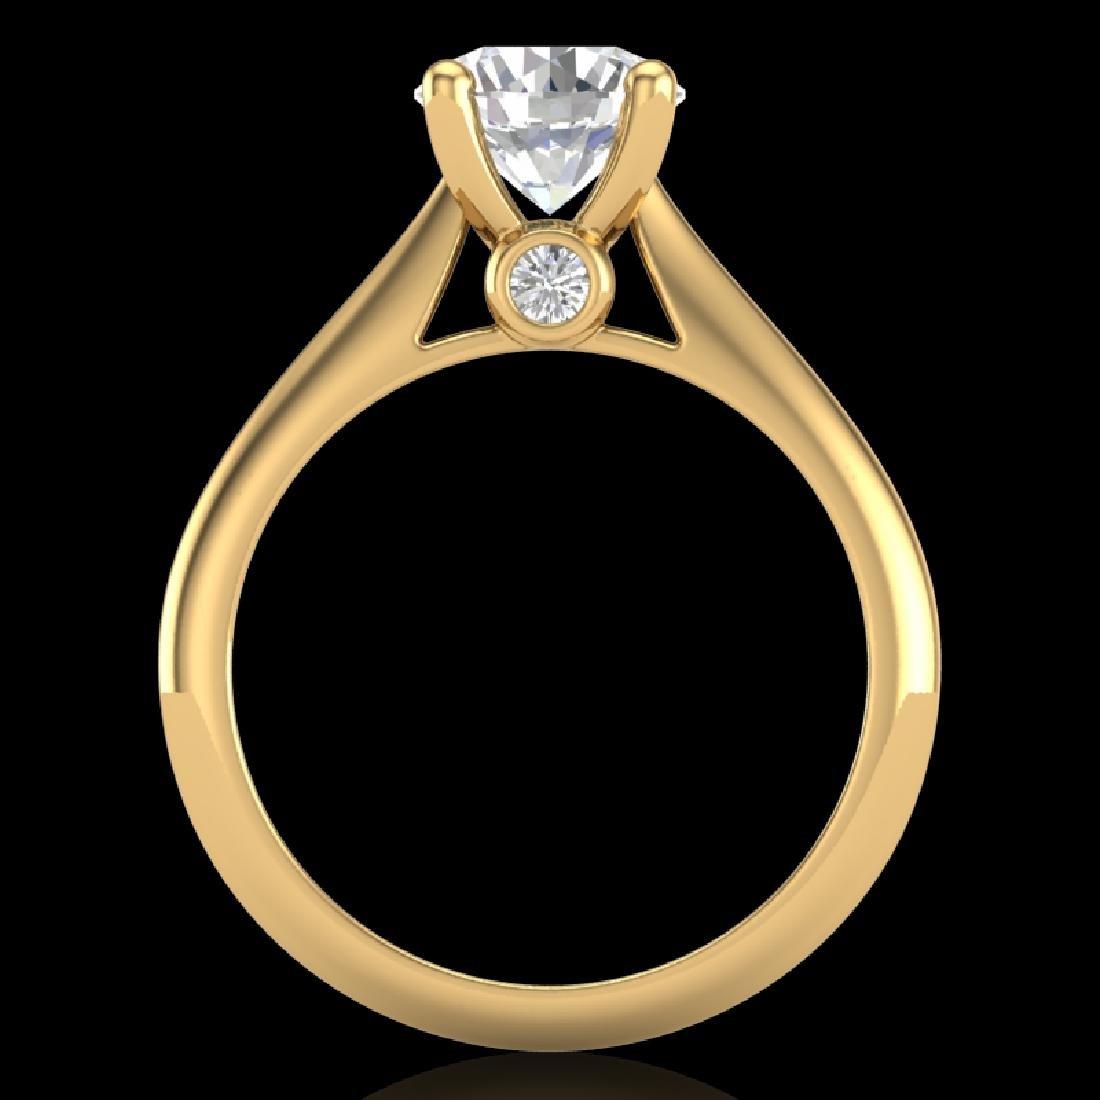 1.6 CTW VS/SI Diamond Art Deco Ring 18K Yellow Gold - 2